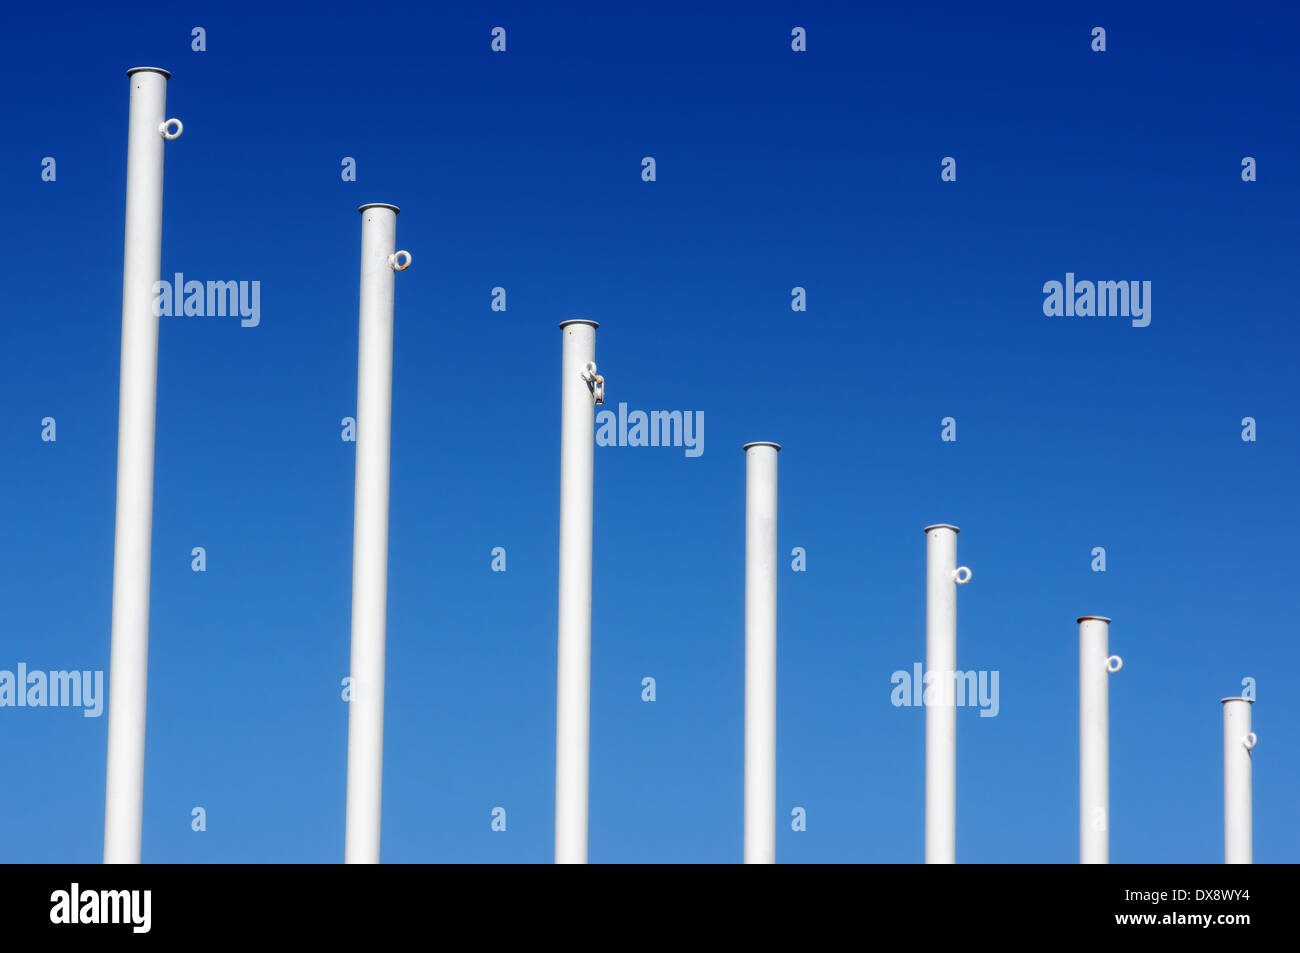 empty white flag poles against blue sky - Stock Image